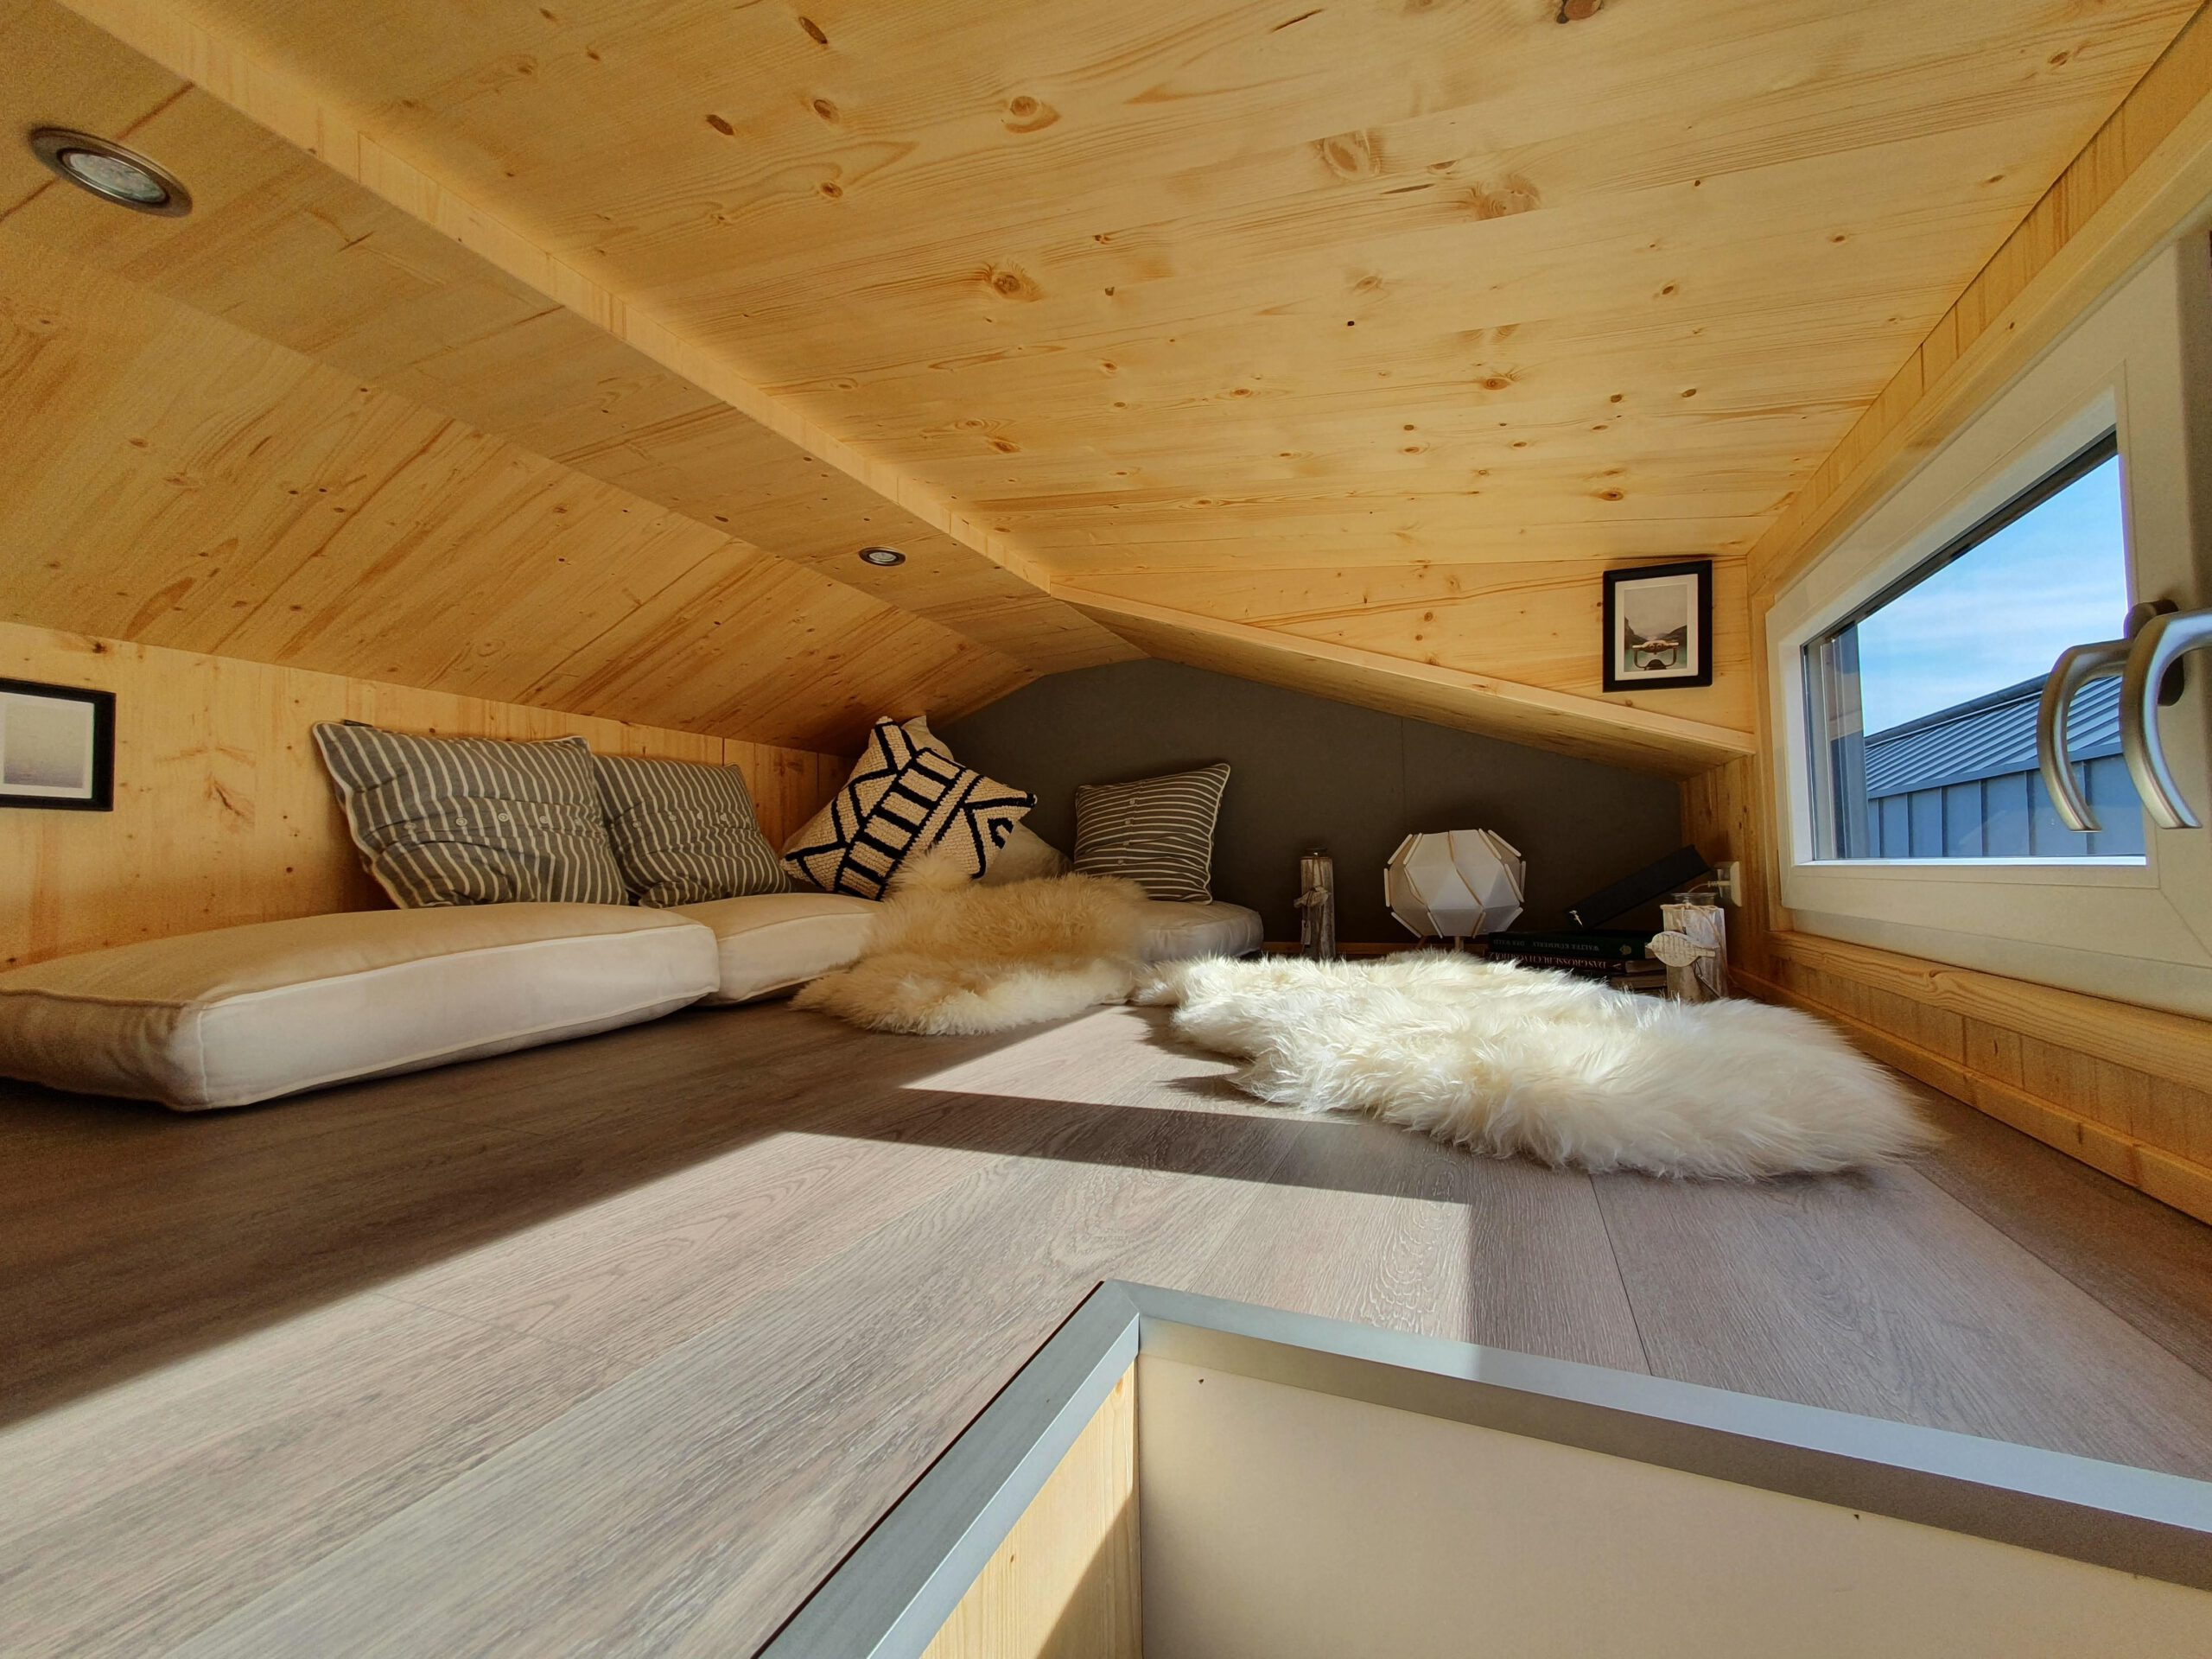 Die Loft-Ebene des Tiny Houses mit Fenster